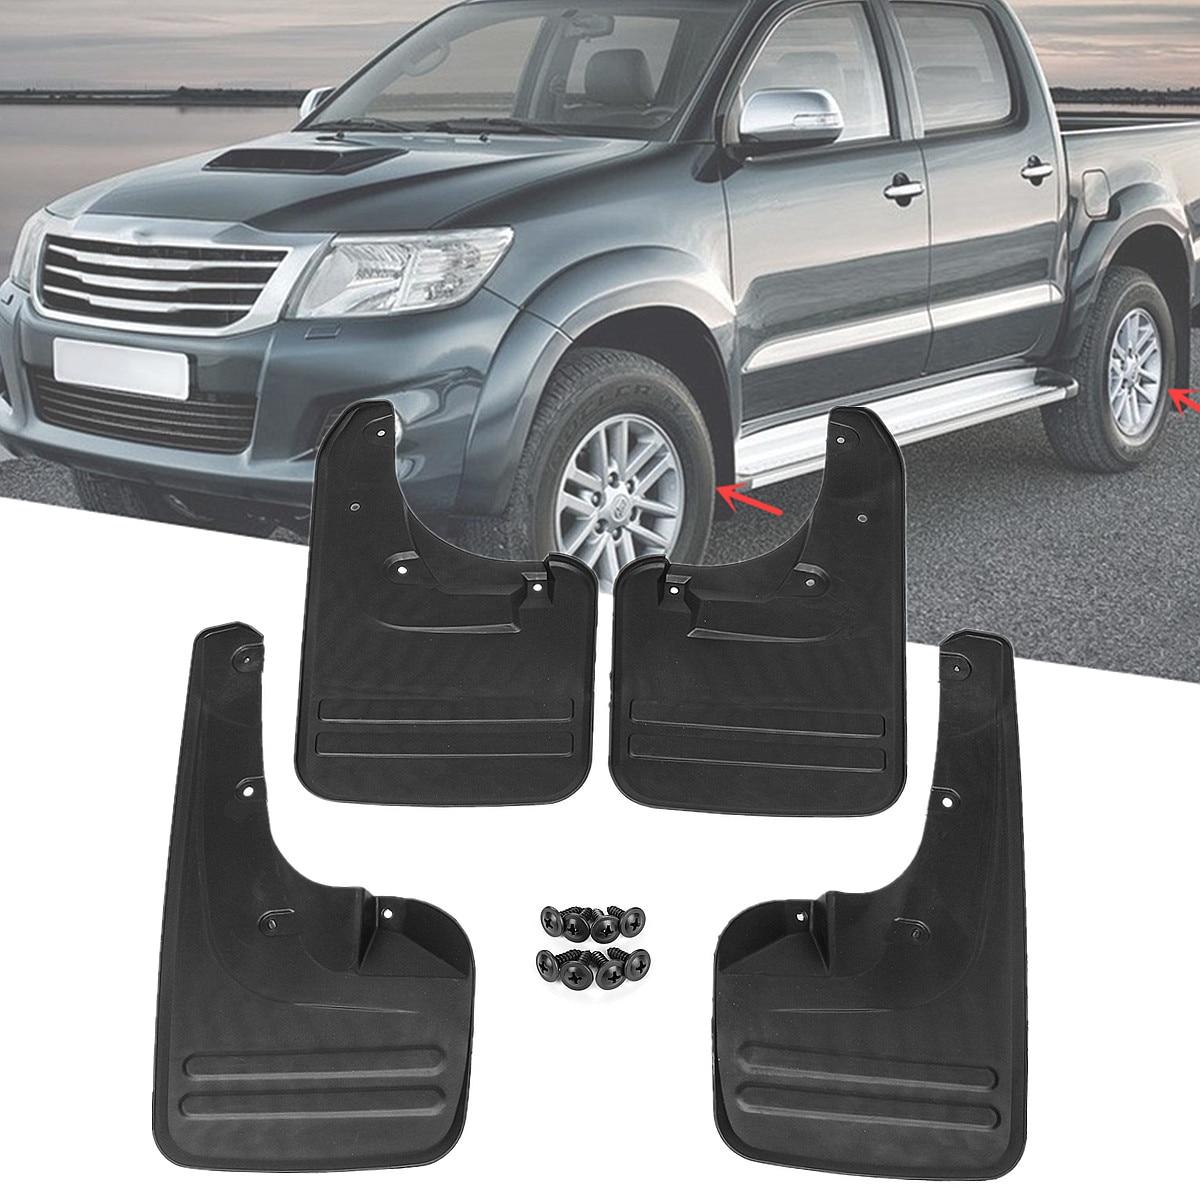 4x Splash Guard Mud Flaps MudFlaps for 2014-2017 Toyota Corolla LE Sedan L4 1.8L